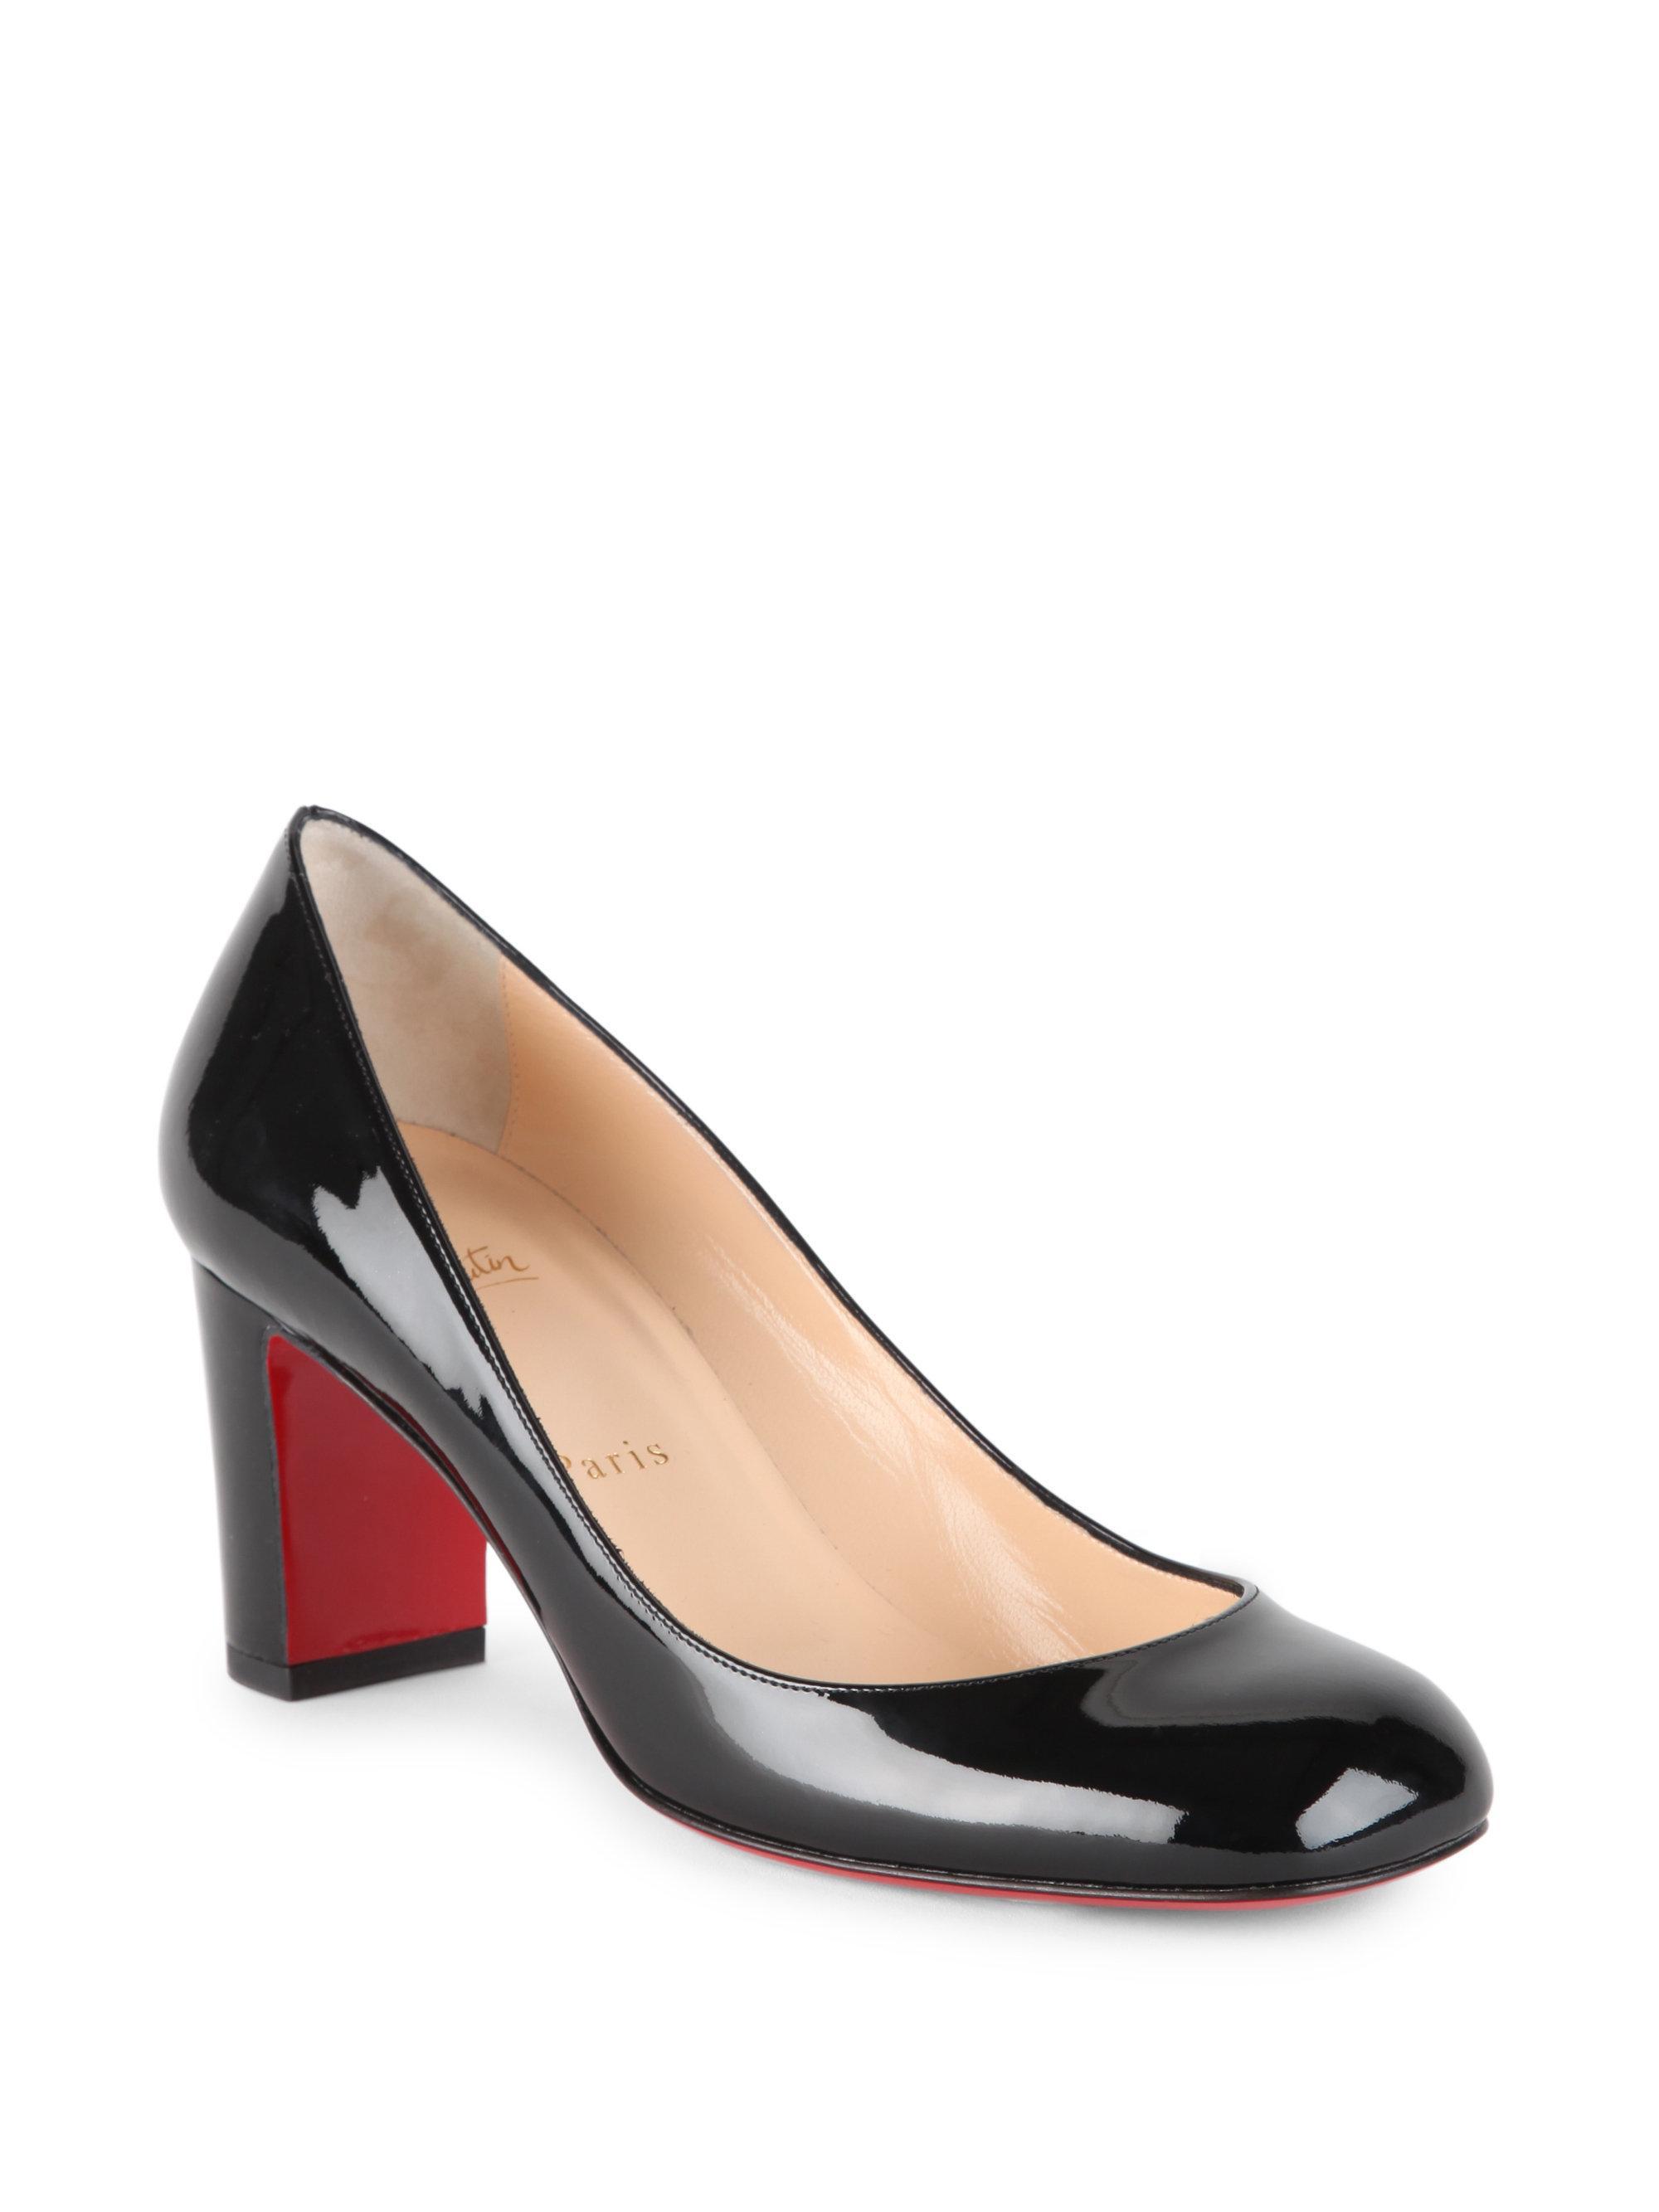 size 40 6dfc7 c8e36 Christian Louboutin Black Cadrilla 70 Patent Leather Block Heel Pumps